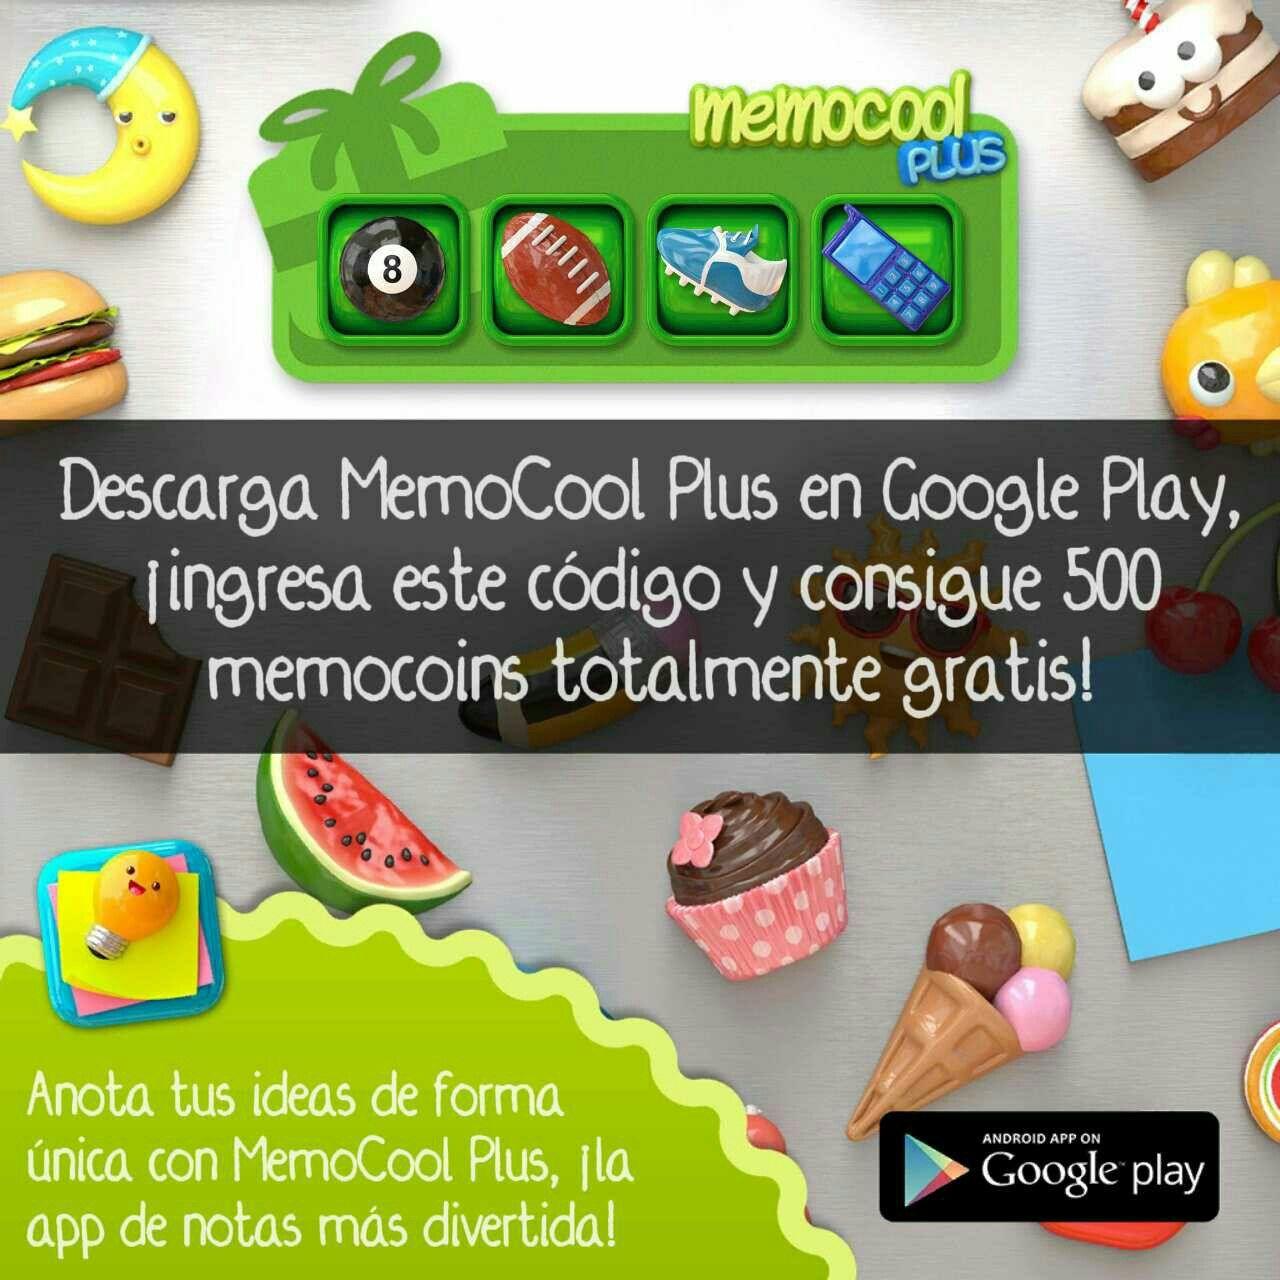 Codigo memocool figuras en porcelana fr a by gabriela for Codigo nuevo instagram